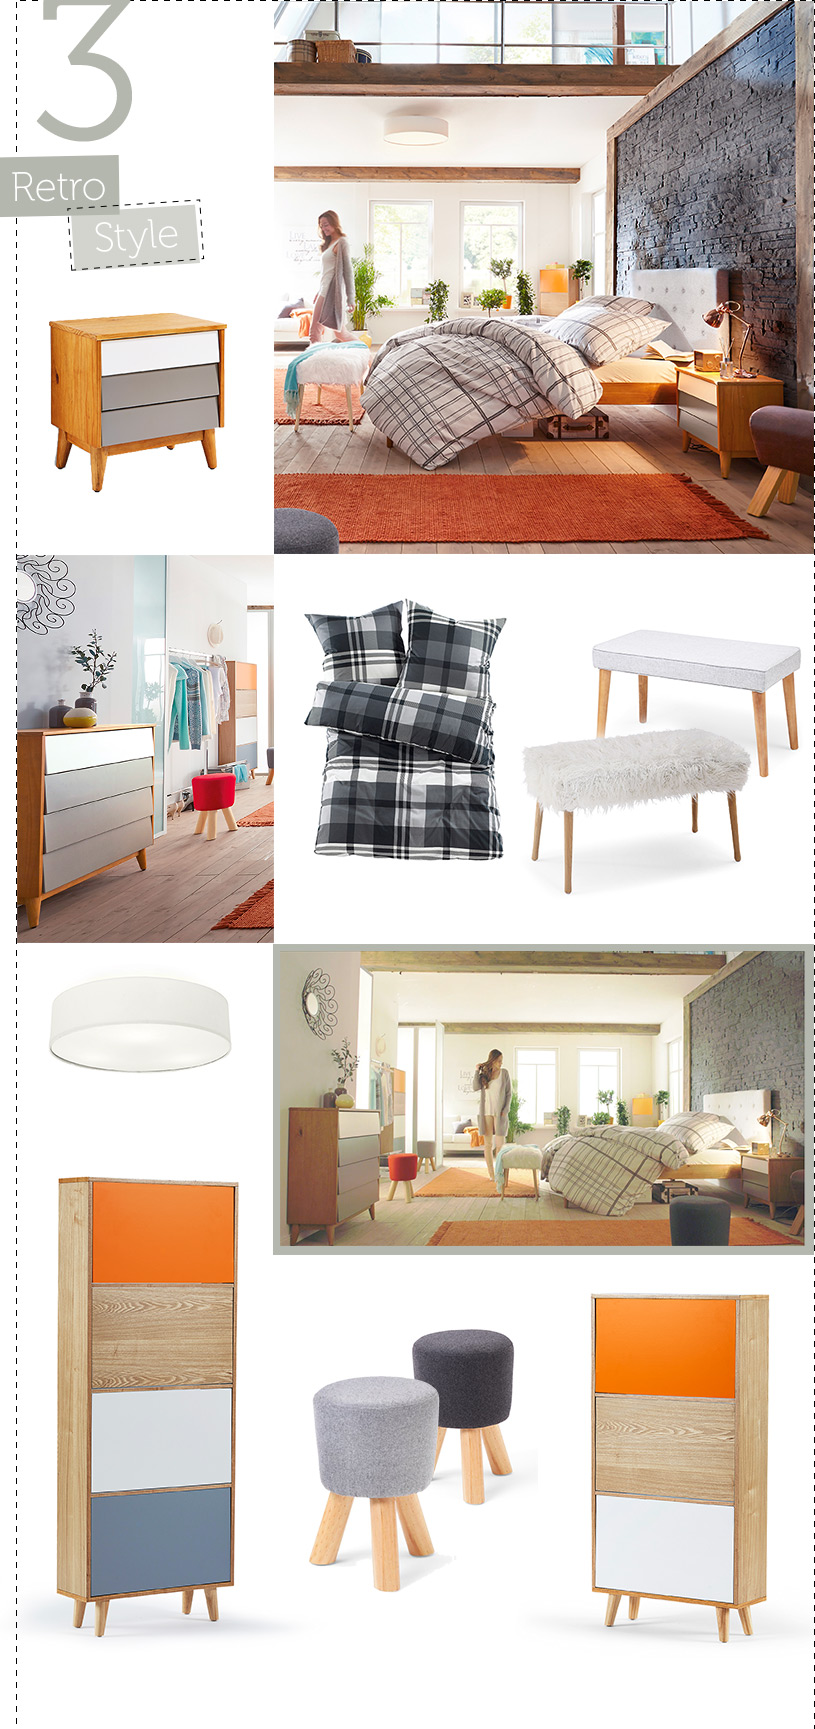 neue m bel trends inspiration wohnen. Black Bedroom Furniture Sets. Home Design Ideas